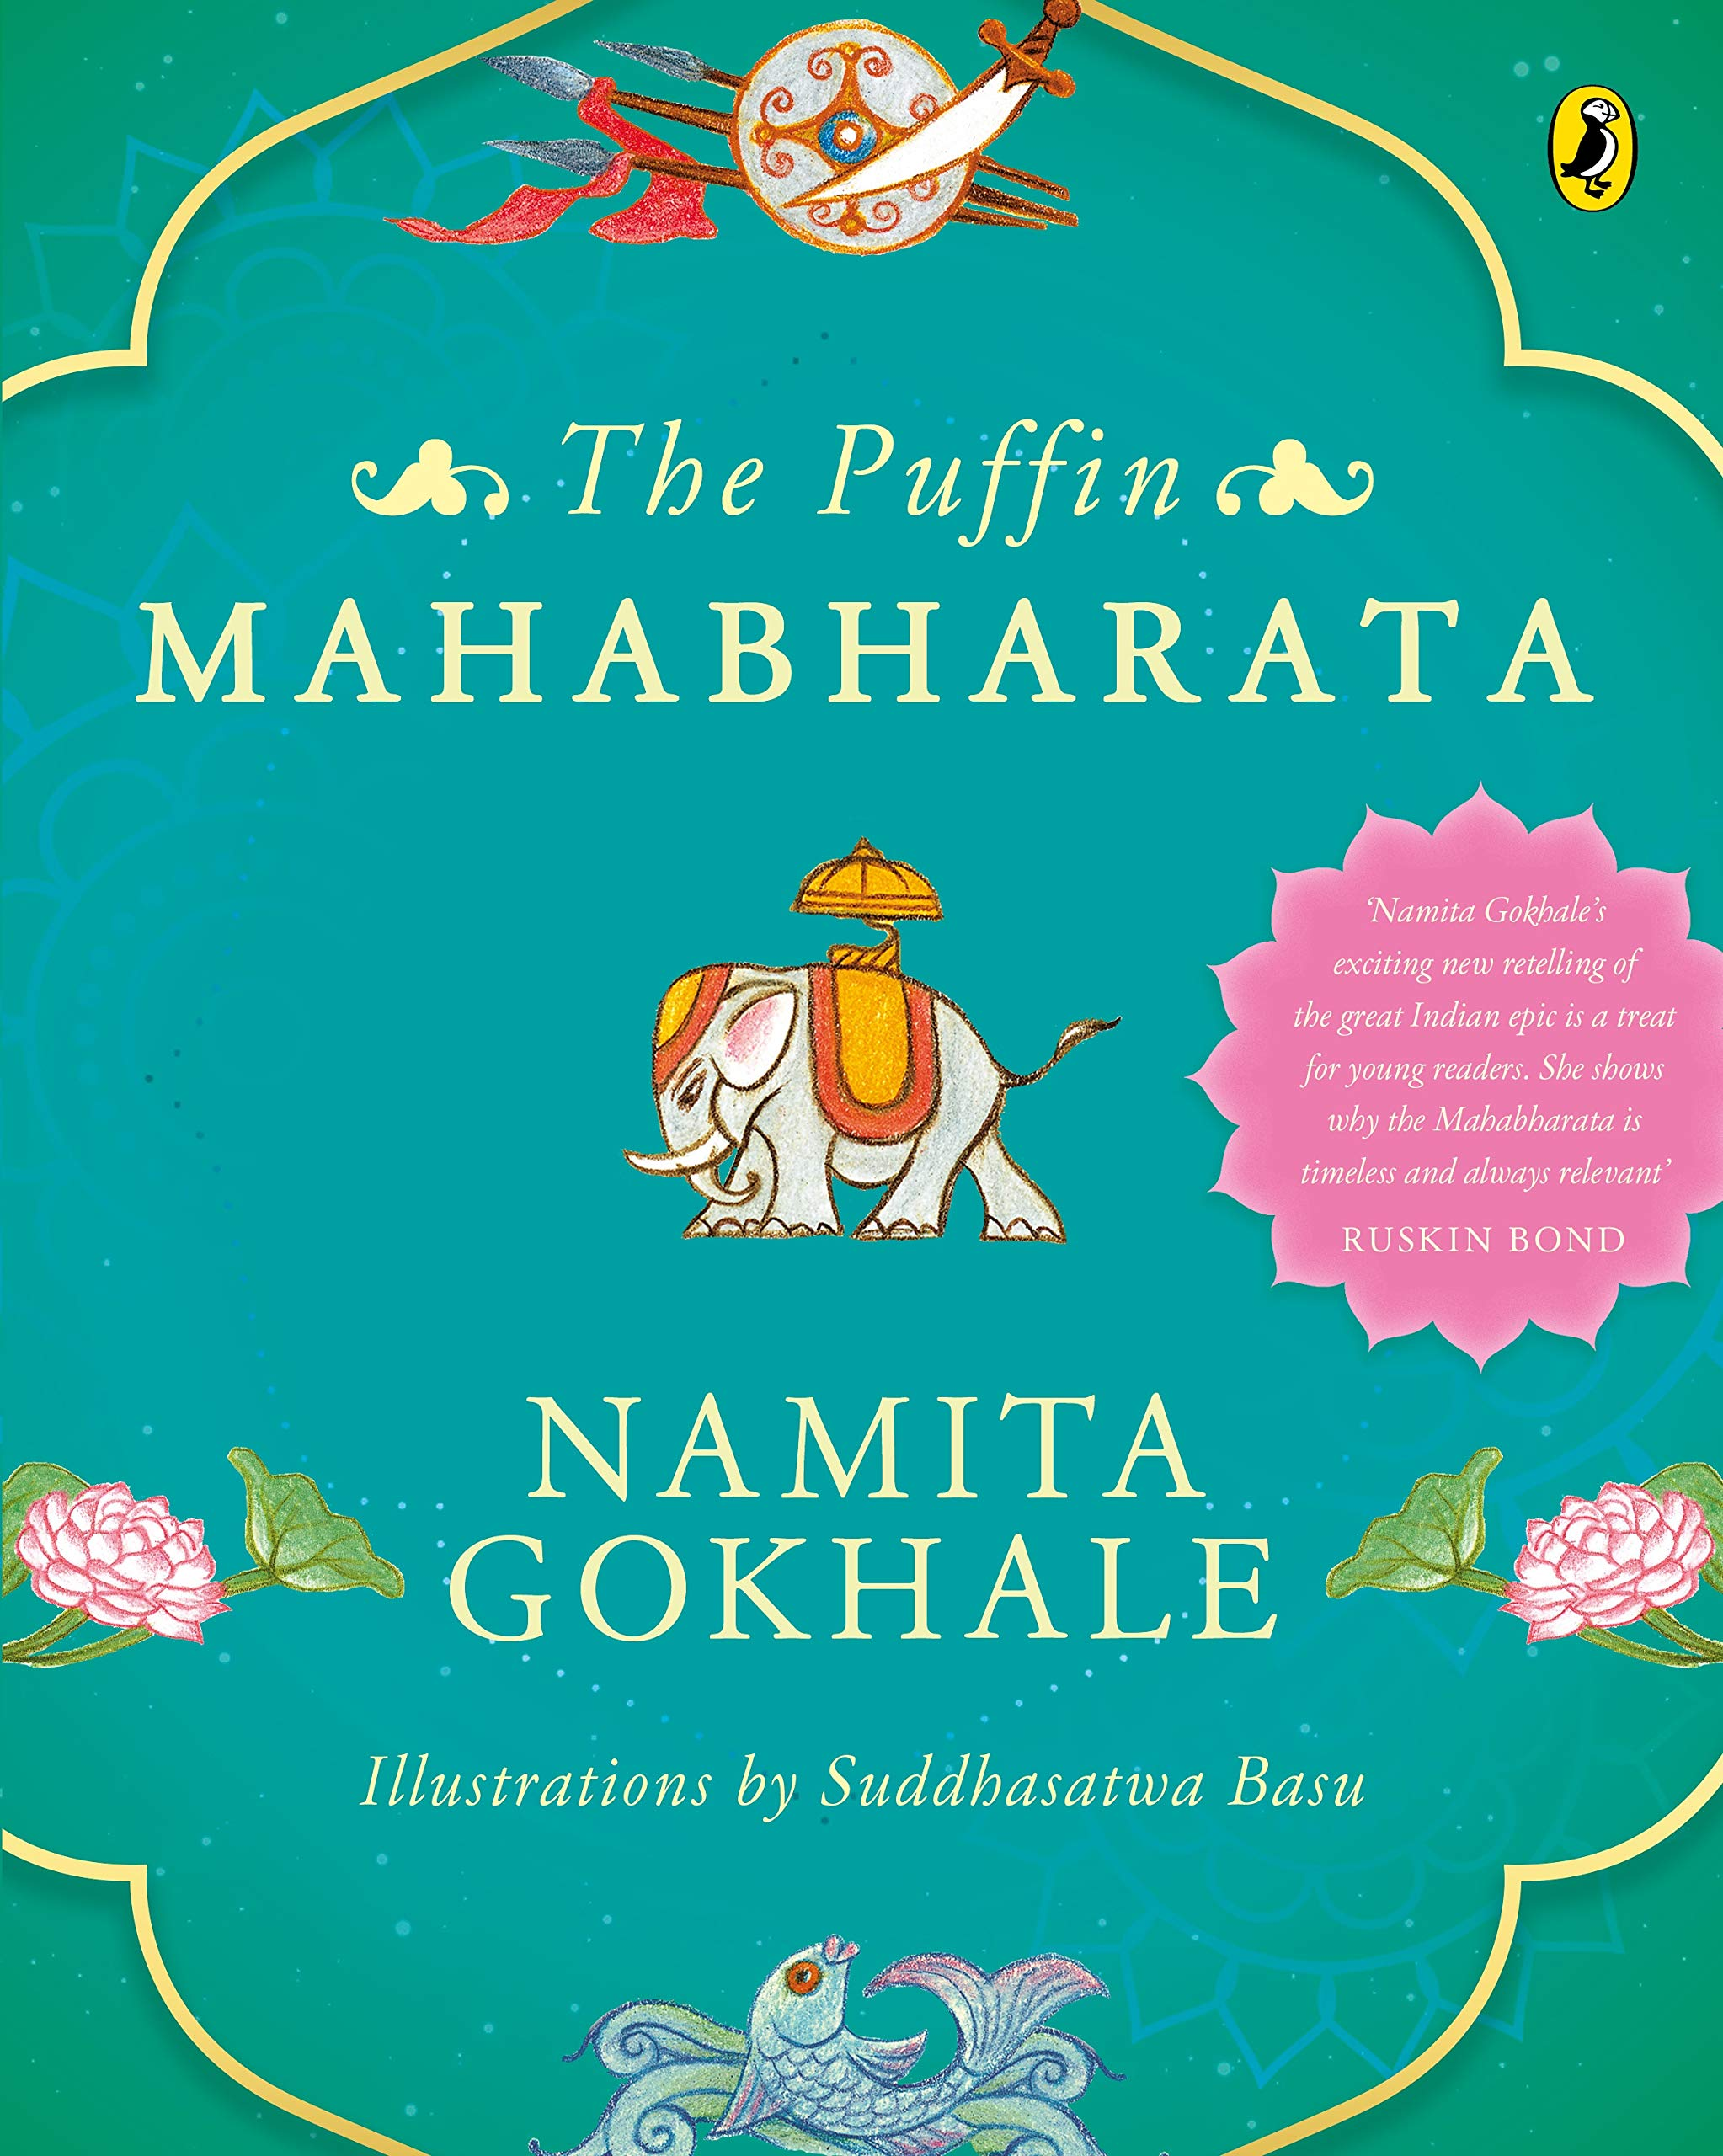 The Puffin Mahabharata  by Namita Gokhle